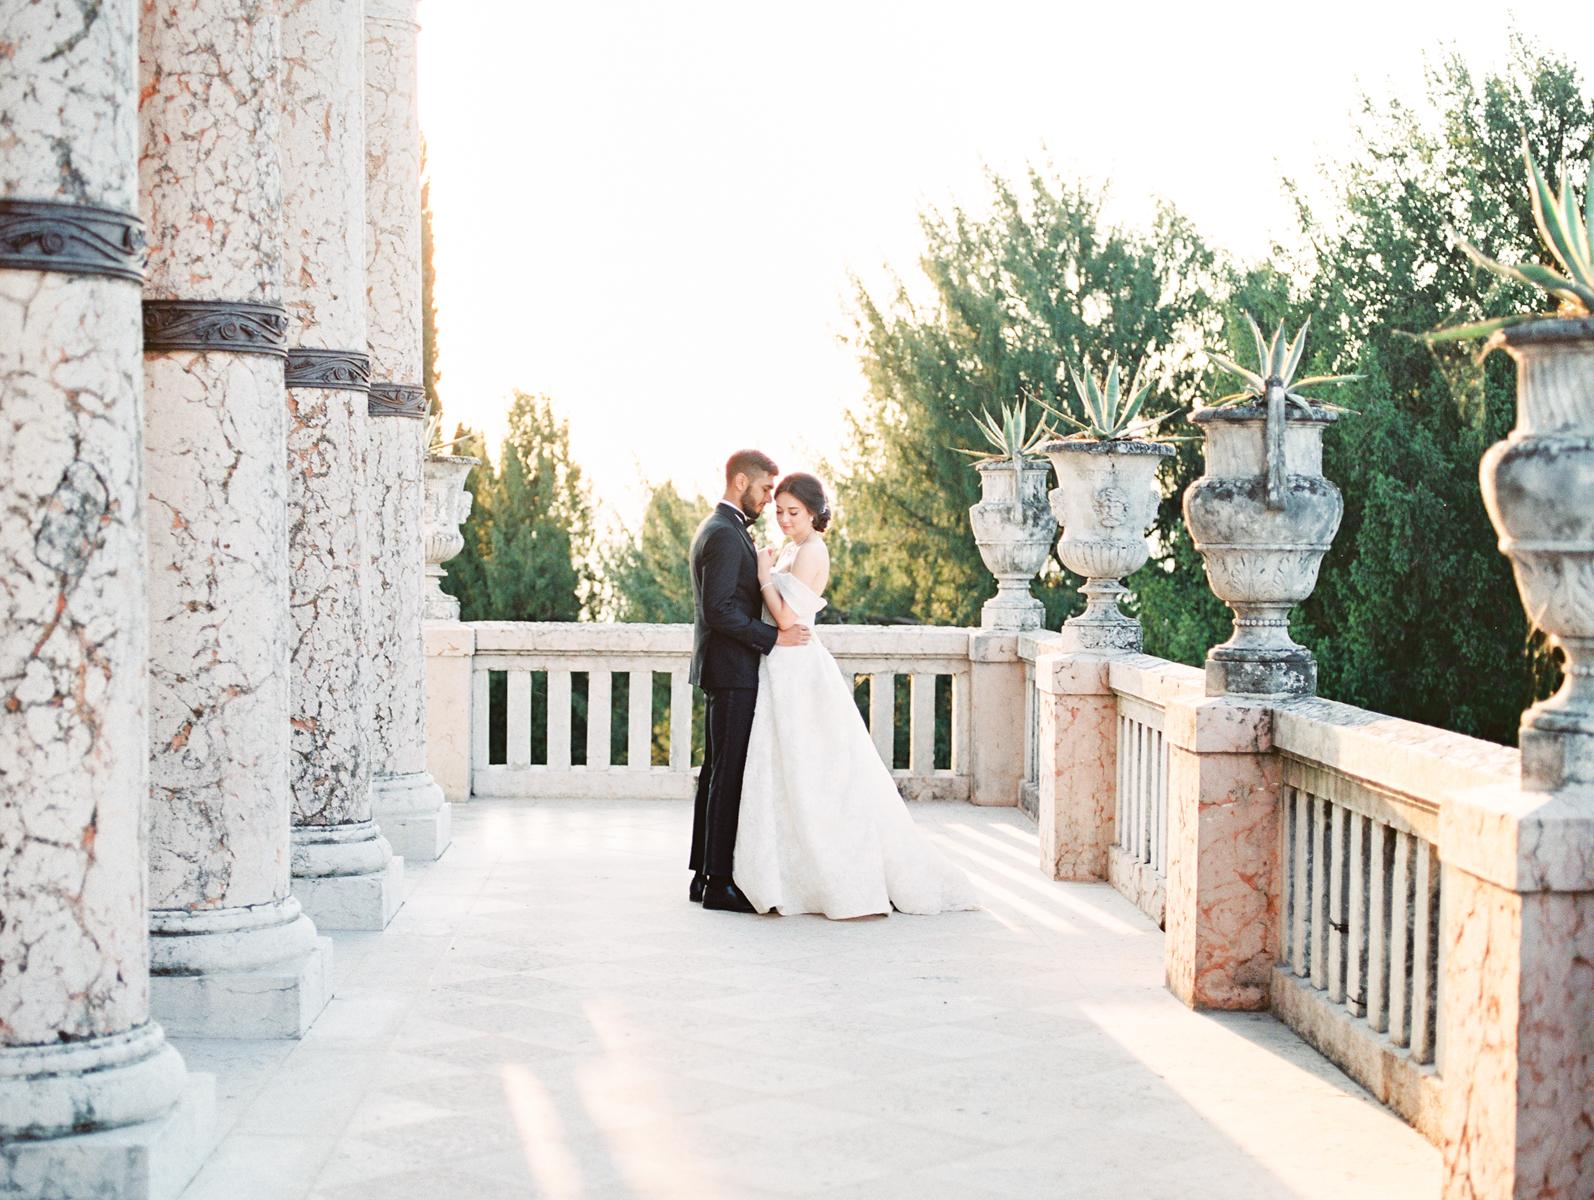 Palace_Villa_Cortine_Hotel_Italian_Wedding_Photographer_Sirmione_AKP-13.jpg